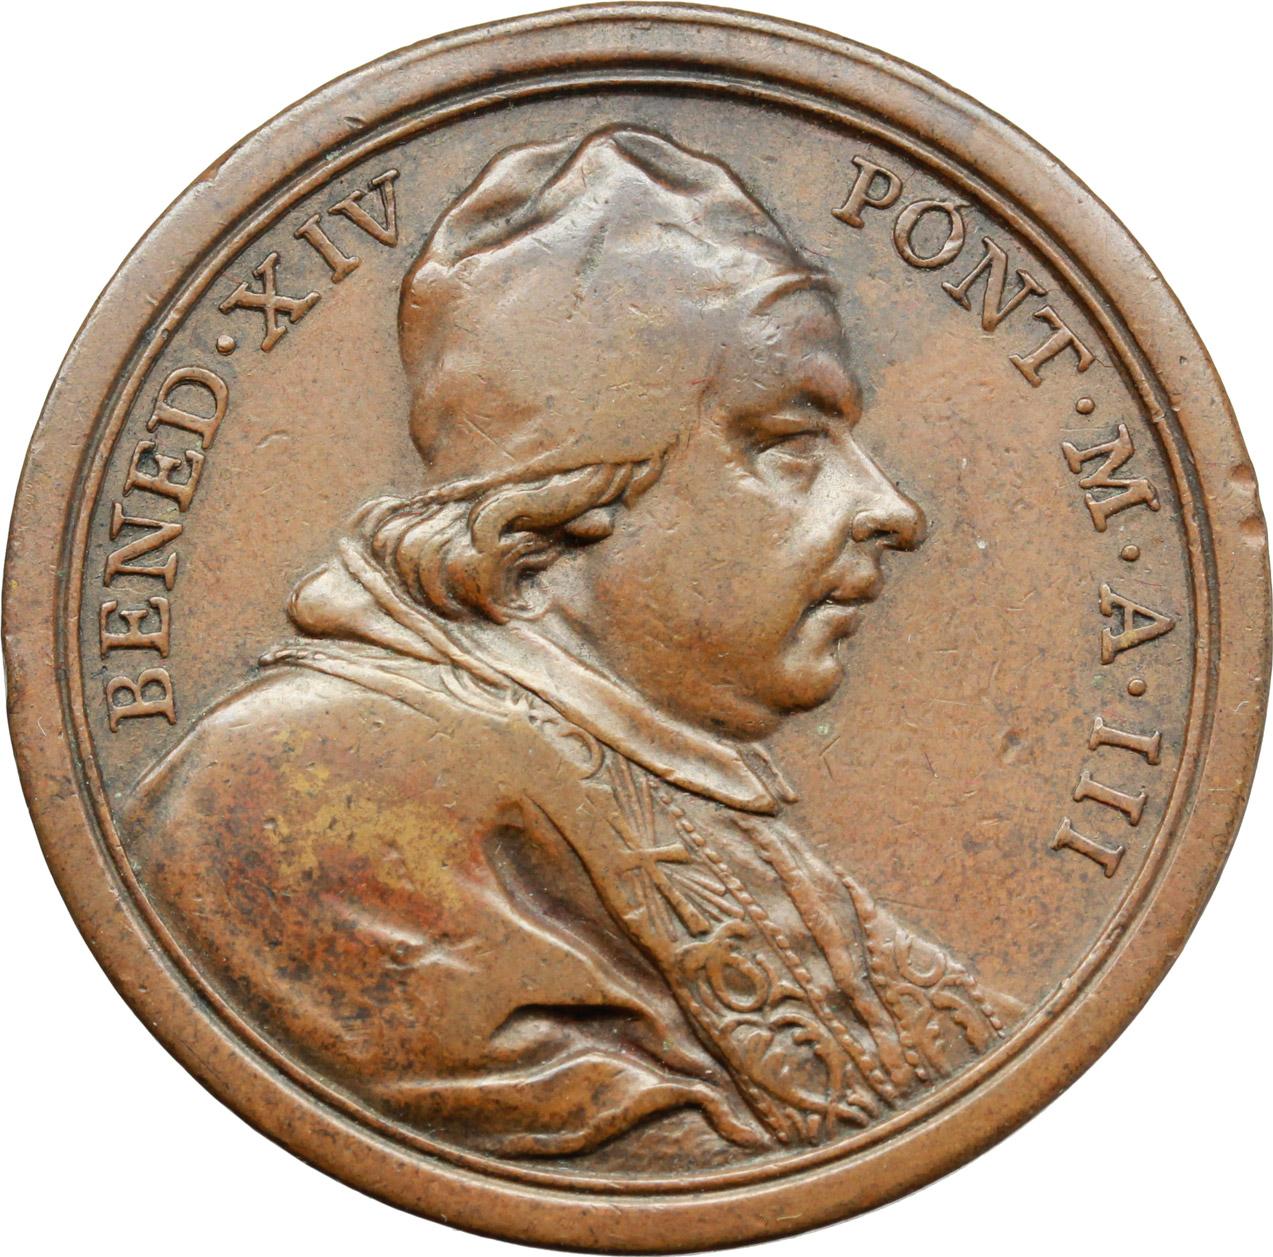 D/ Benedetto XIV (1740-1758), Prospero Lambertini. Medaglia A. III.  D/ BENED XIV PONT MAX A. III. Busto a destra con camauro, mozzetta e stola. R/ MEMORIAE M. CLEM M. BRIT REGINAE. Monumento funebre  in San Pietro. Patr. 13. AE.   mm. 35.00    BB+.